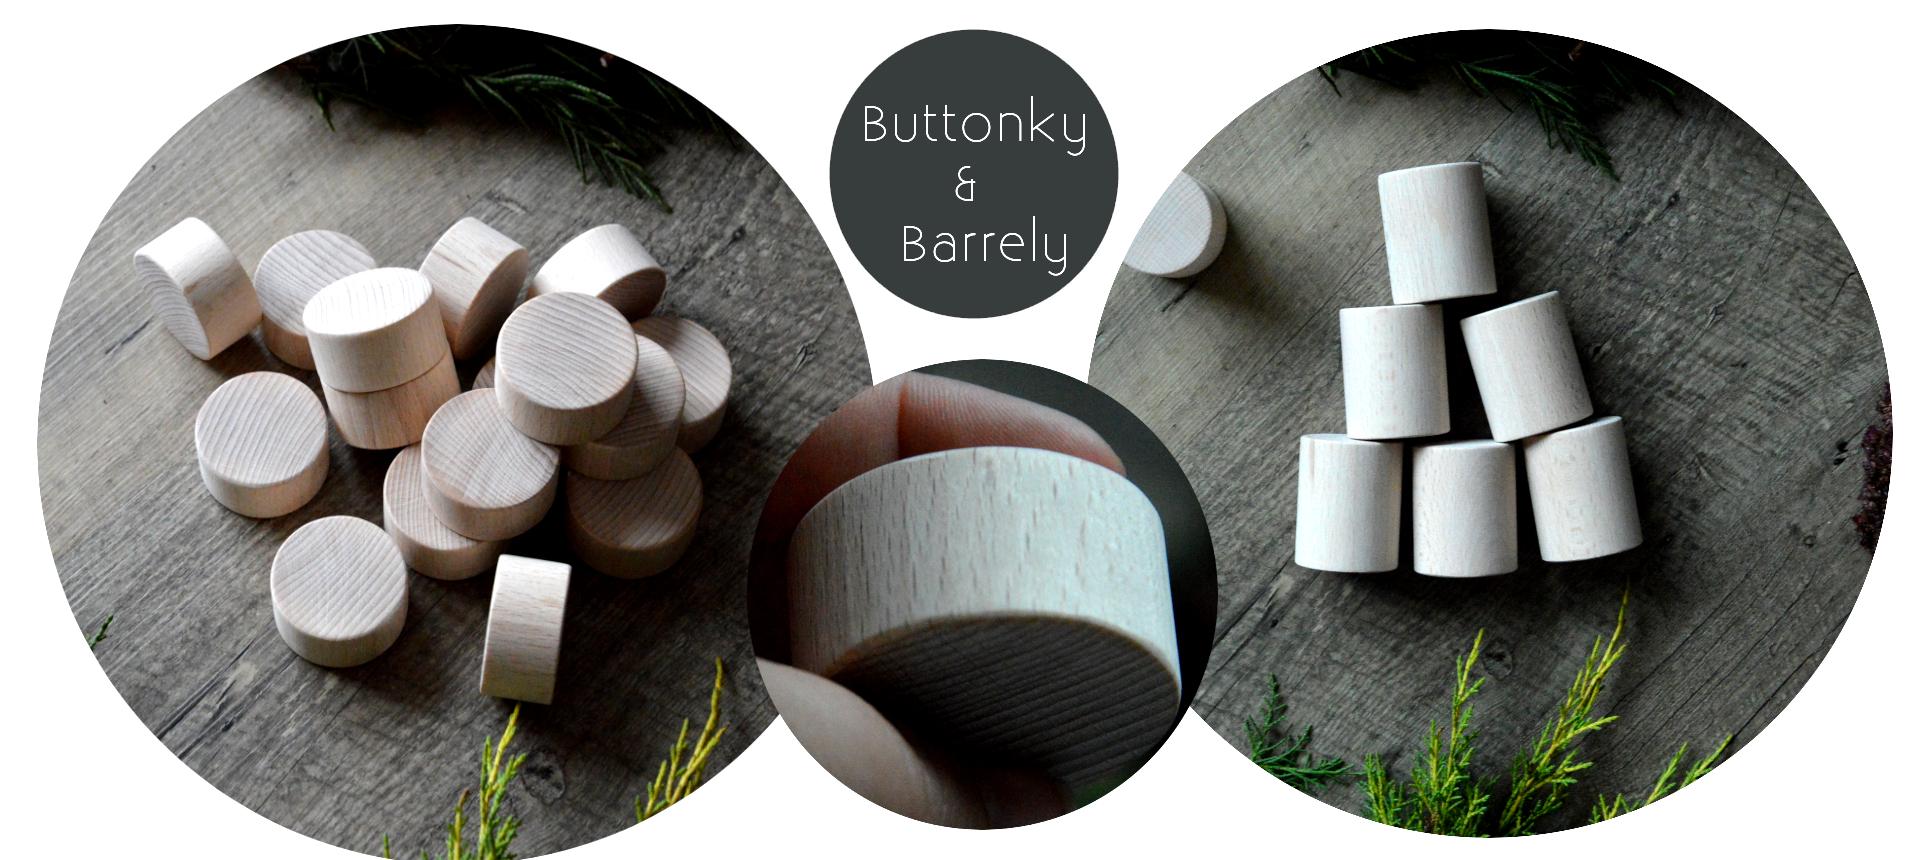 buttonkyabarrely_1